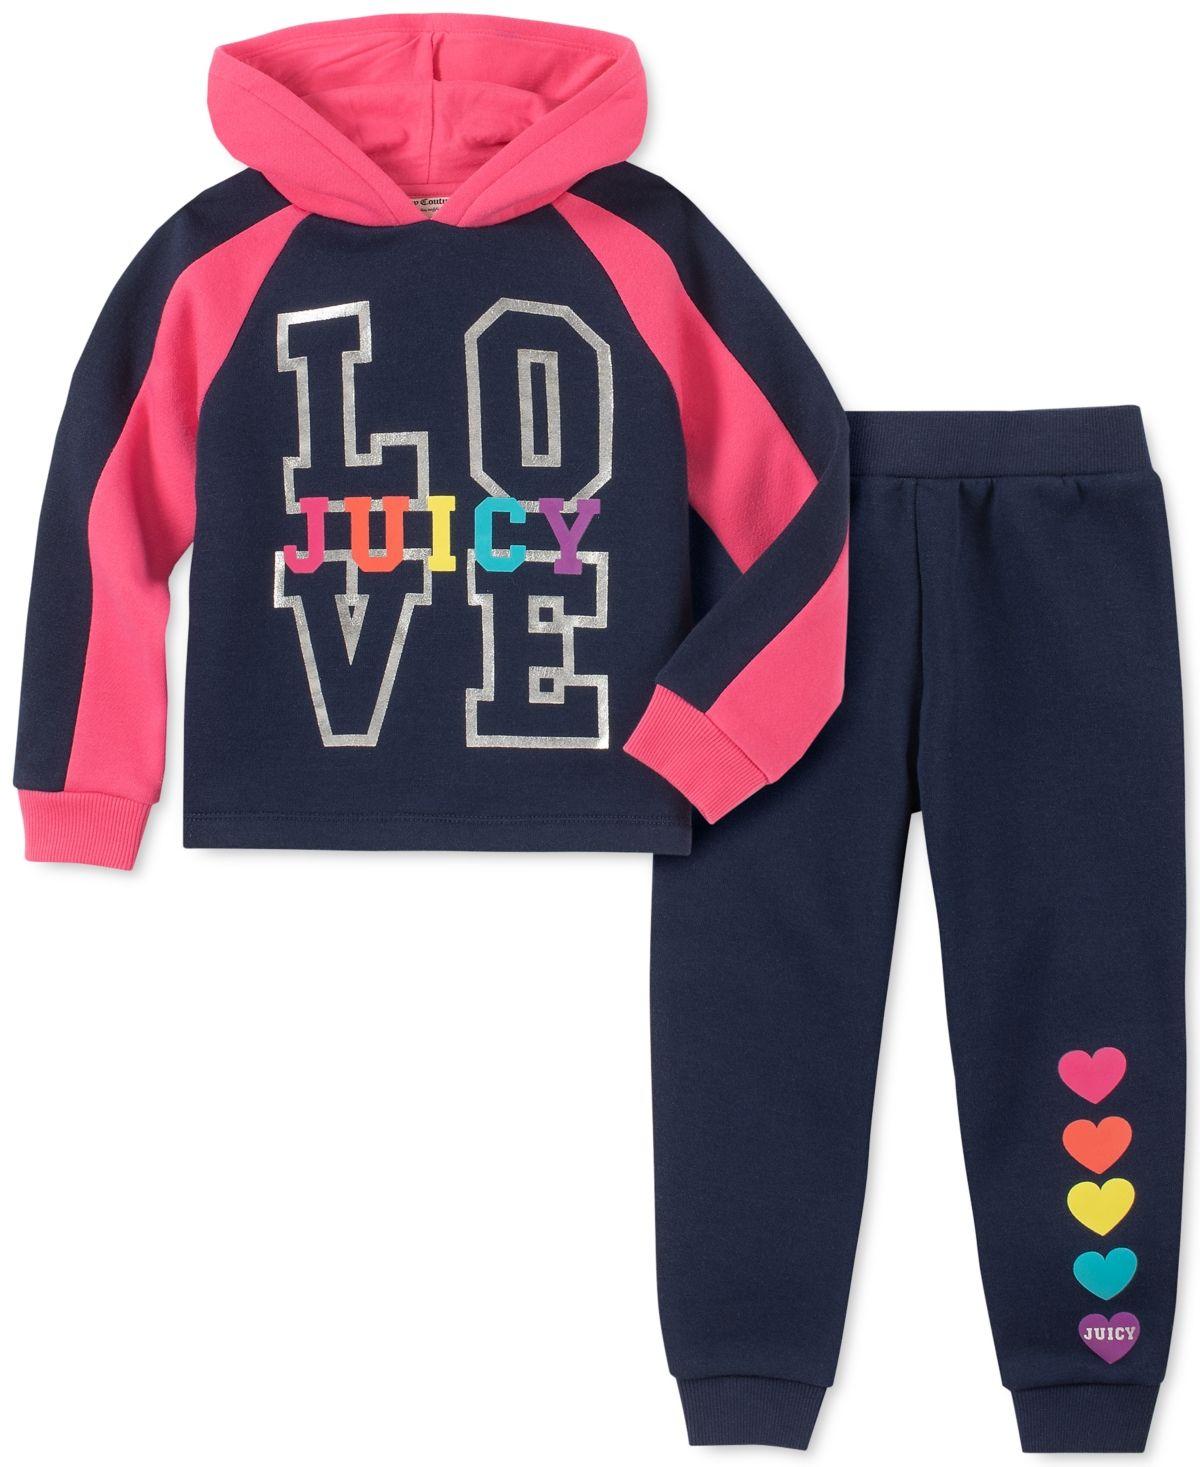 2PCS Toddler Kids Boys Tracksuits Hoodies Joggers Pants Sweatshirts Outfits Sets